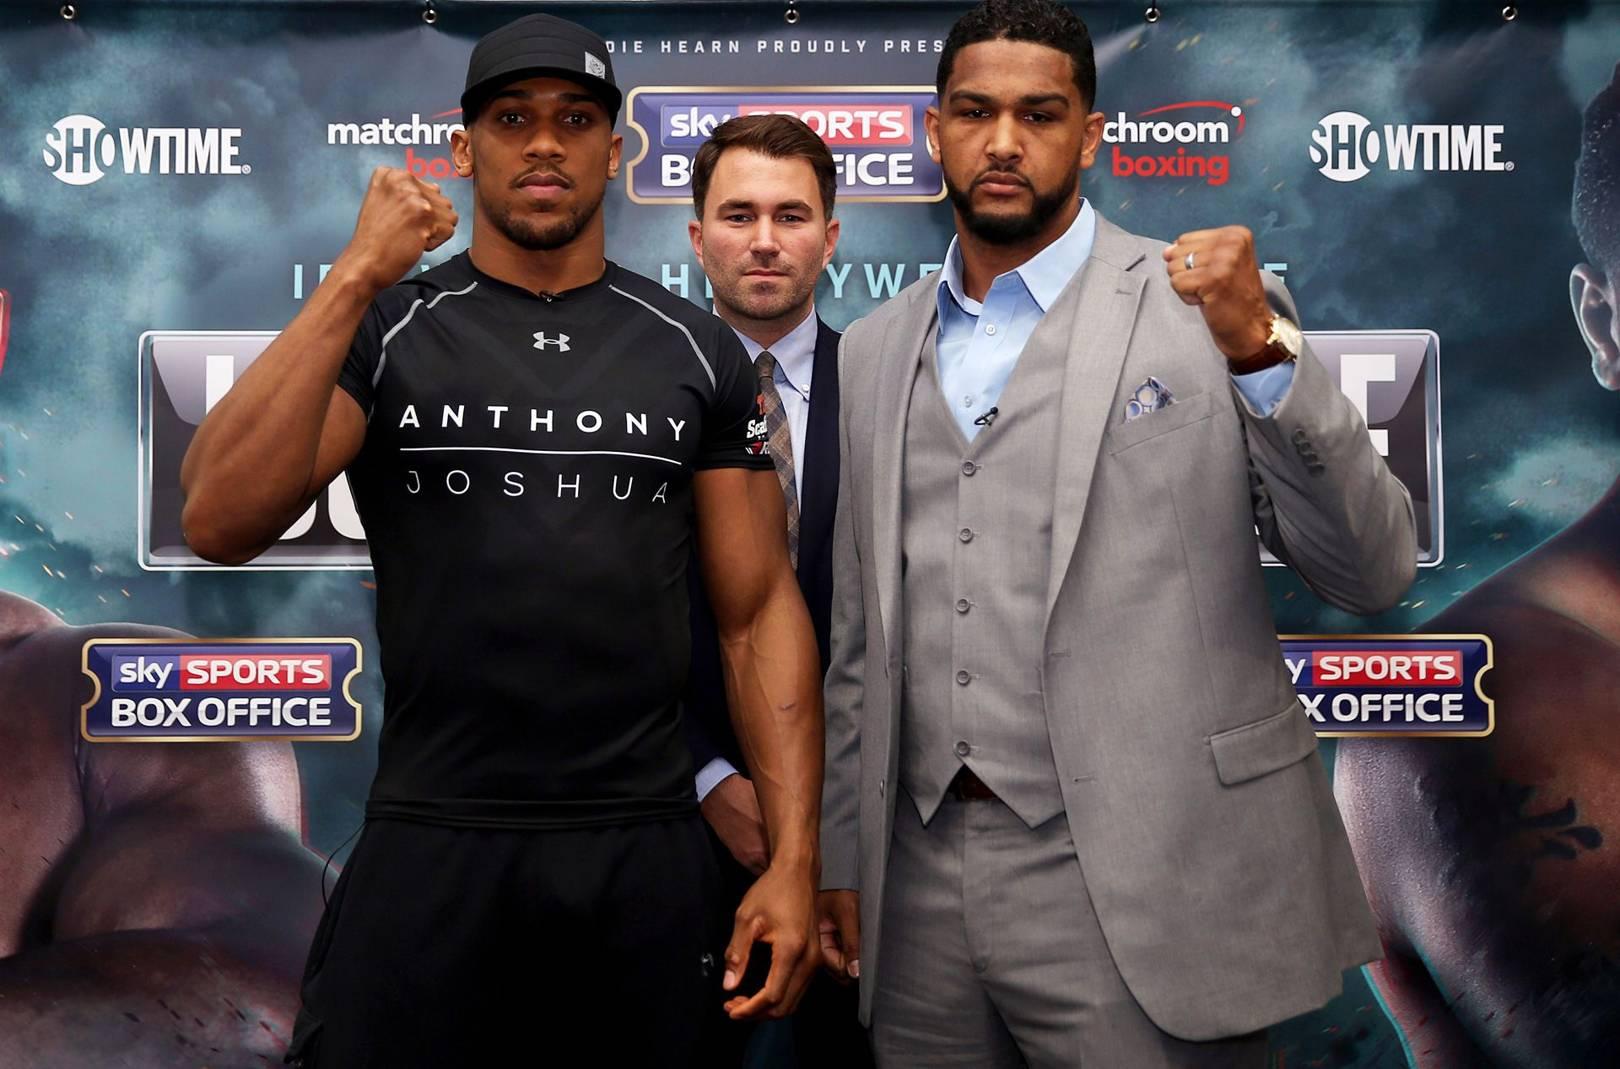 Anthony Joshua V Dominic Breazeale Headlines A Huge Night Of Boxing